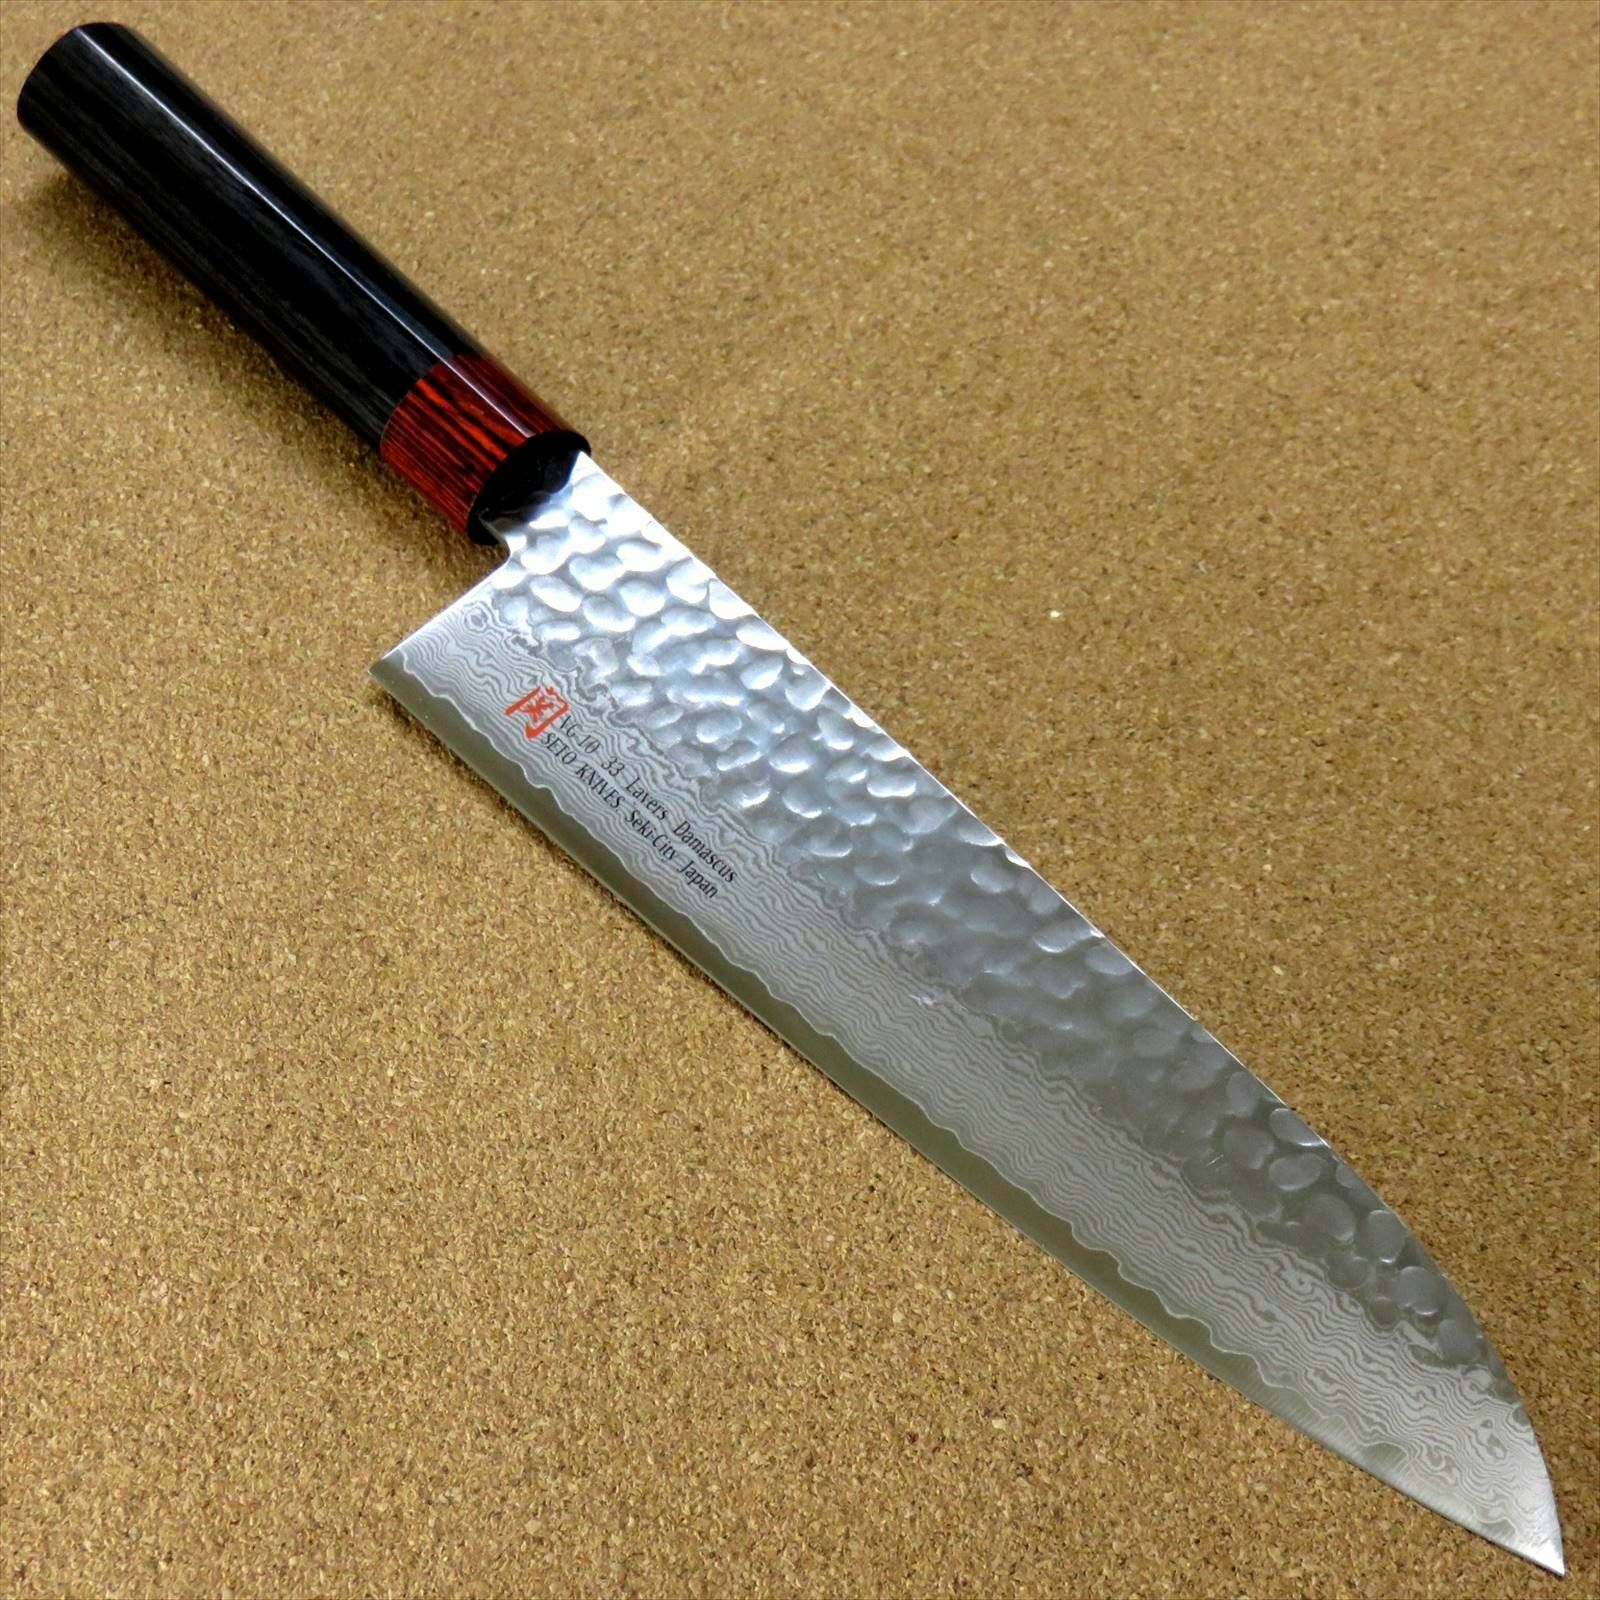 Japonais Seto ISEYA-I Cuisine Gyuto chef couteau 8.3  Damas martelé SEKI JAPAN